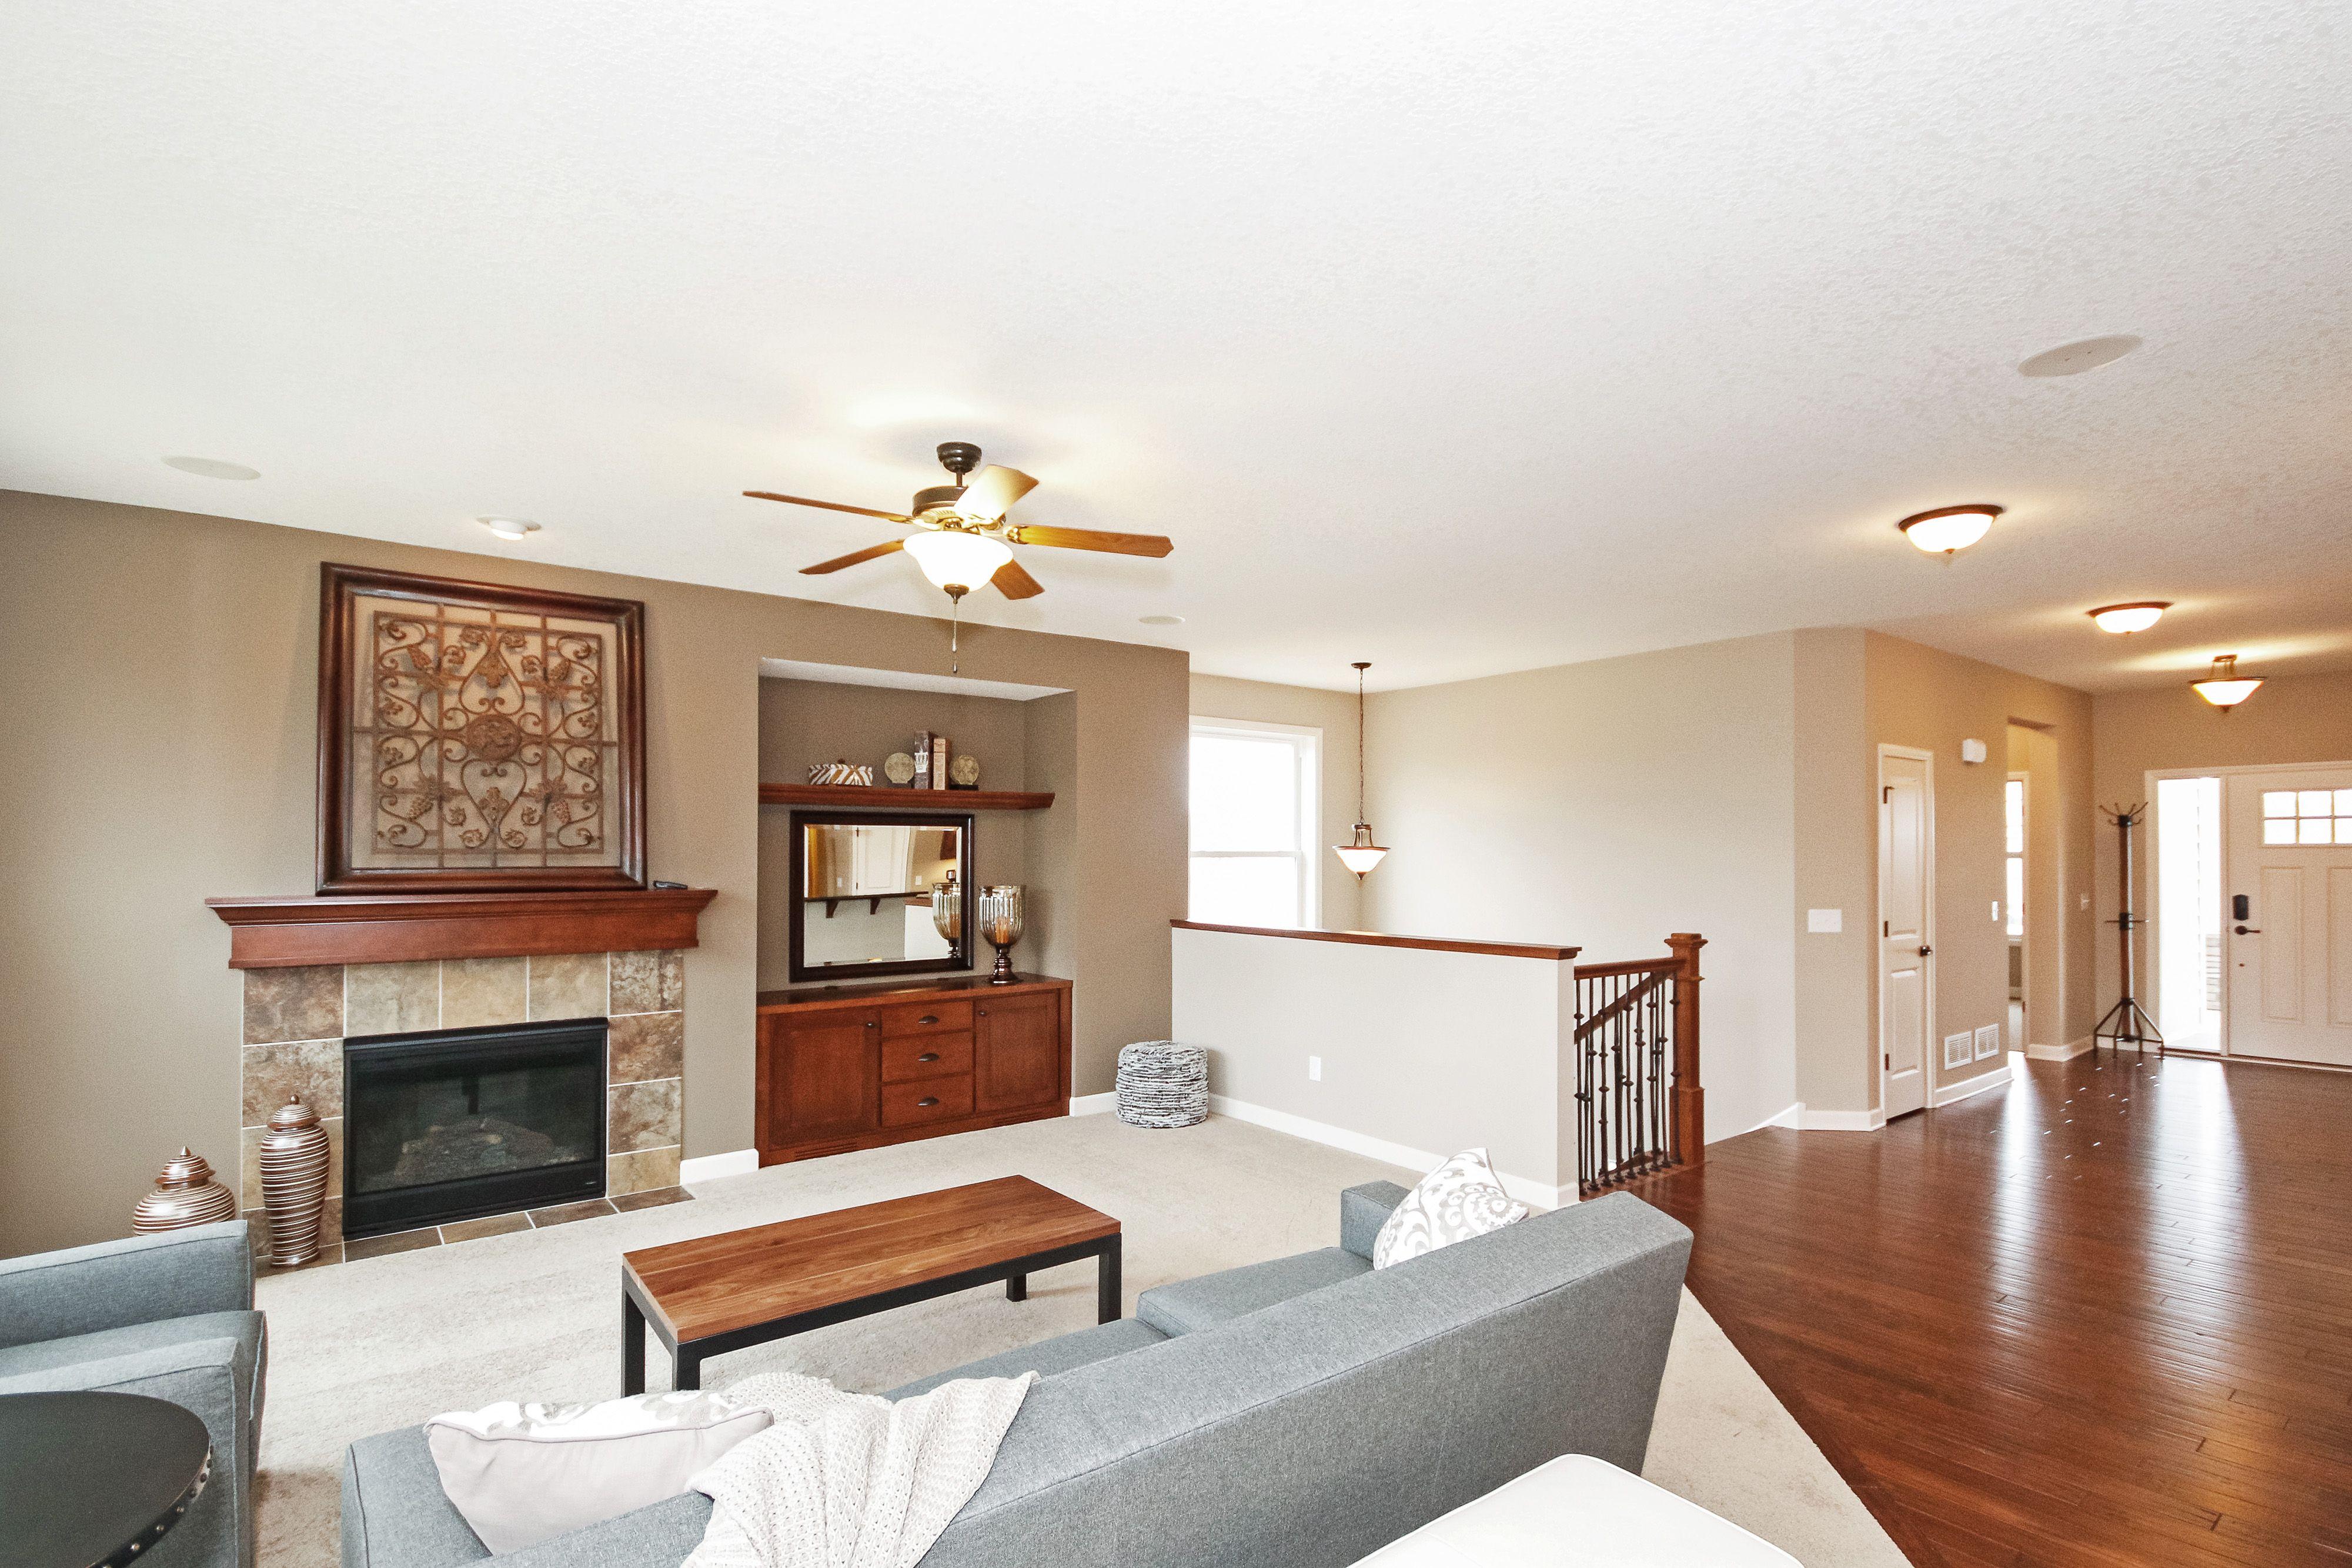 Living Room | Brooklyn park, Room, Living room